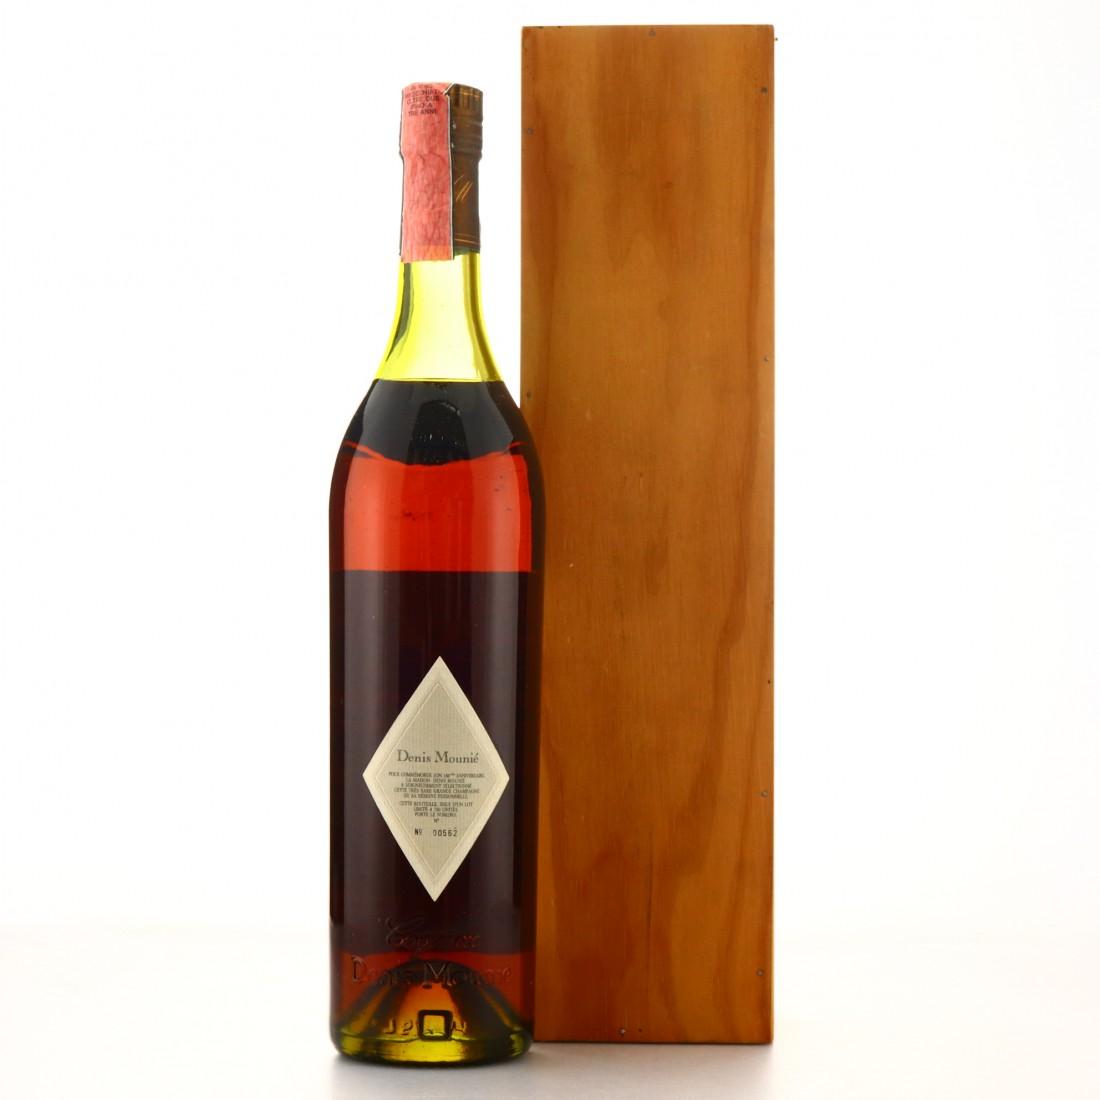 Denis Mounié 150th Anniversary Grande Champagne Cognac / Soffiantino Import